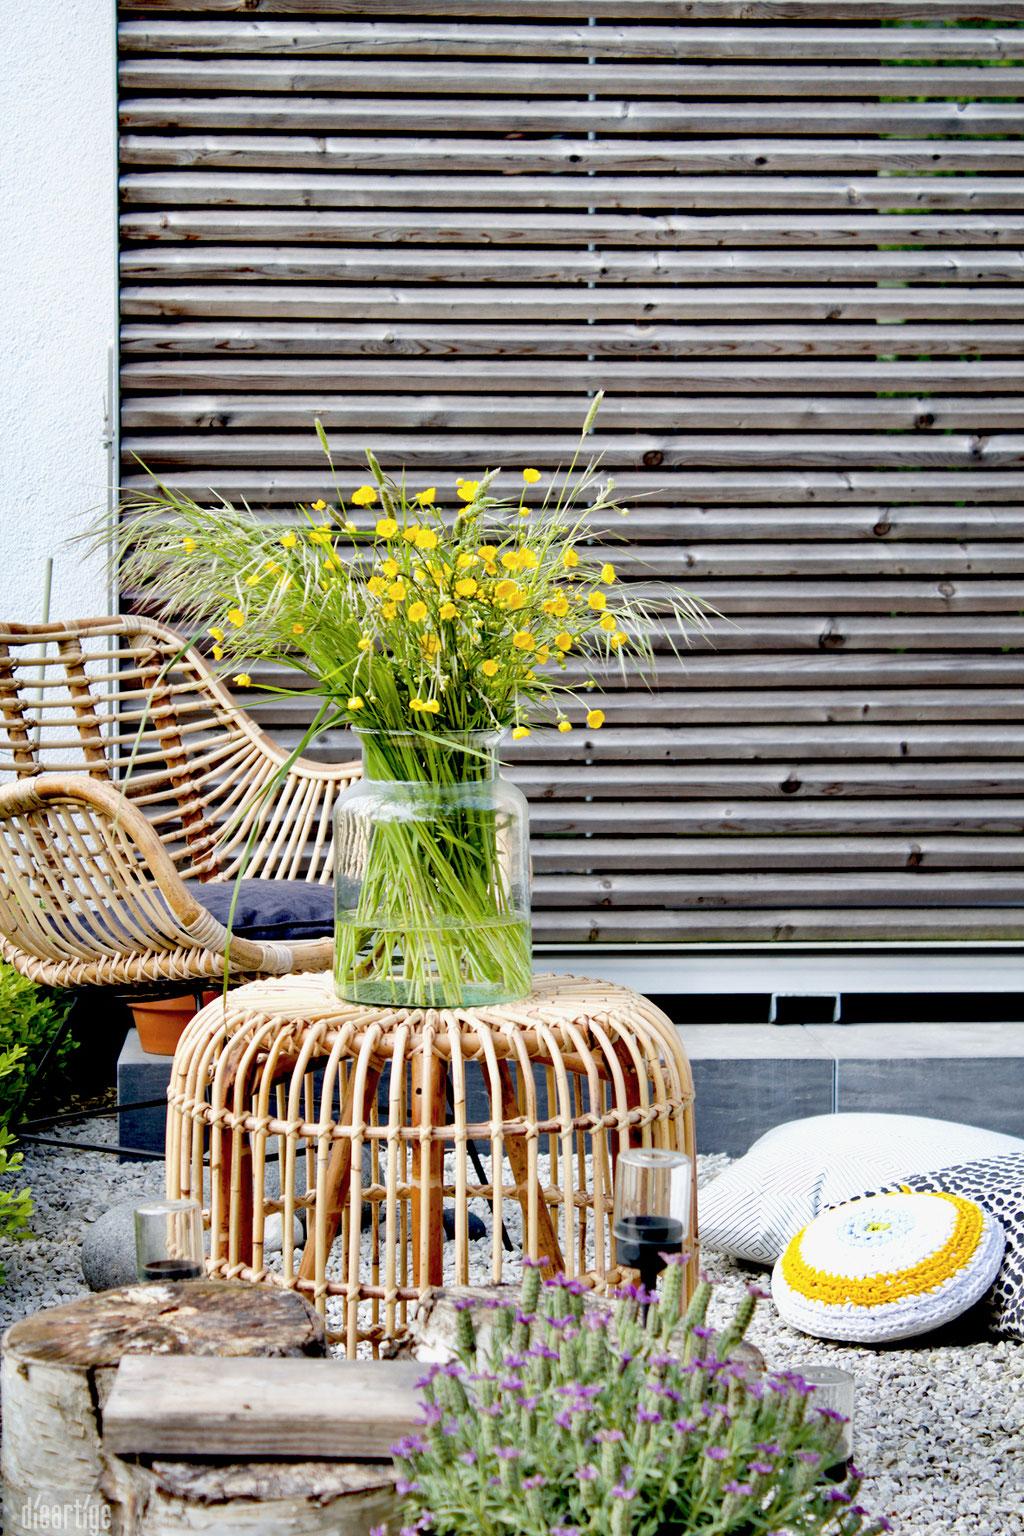 dieartigeBLOG - Rattan-Stuhl, Rattan-Hocker Schiebeladen, Wiesenblumen, gelb, Lumikello